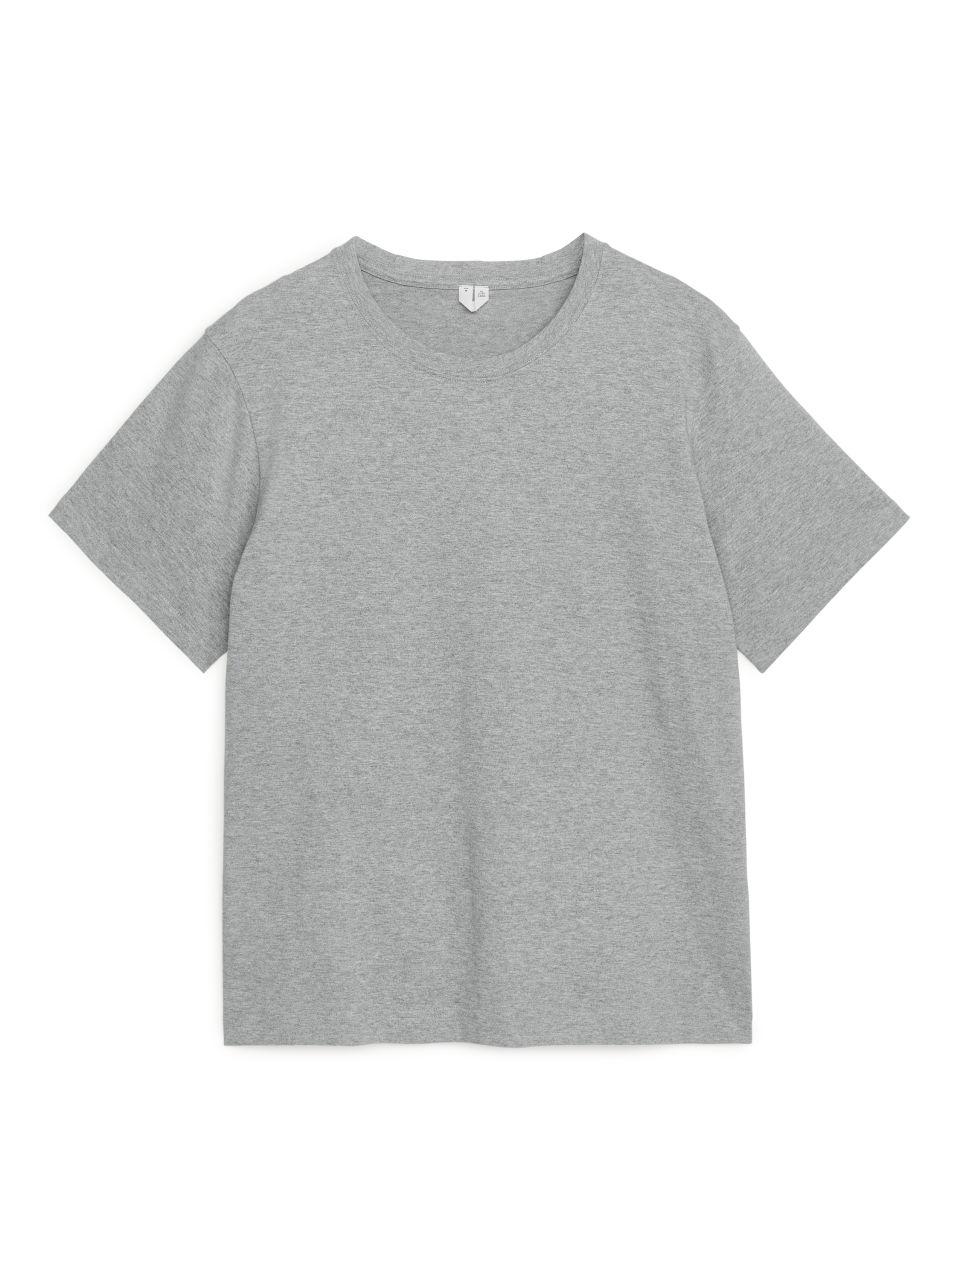 Heavyweight T-Shirt - Grey